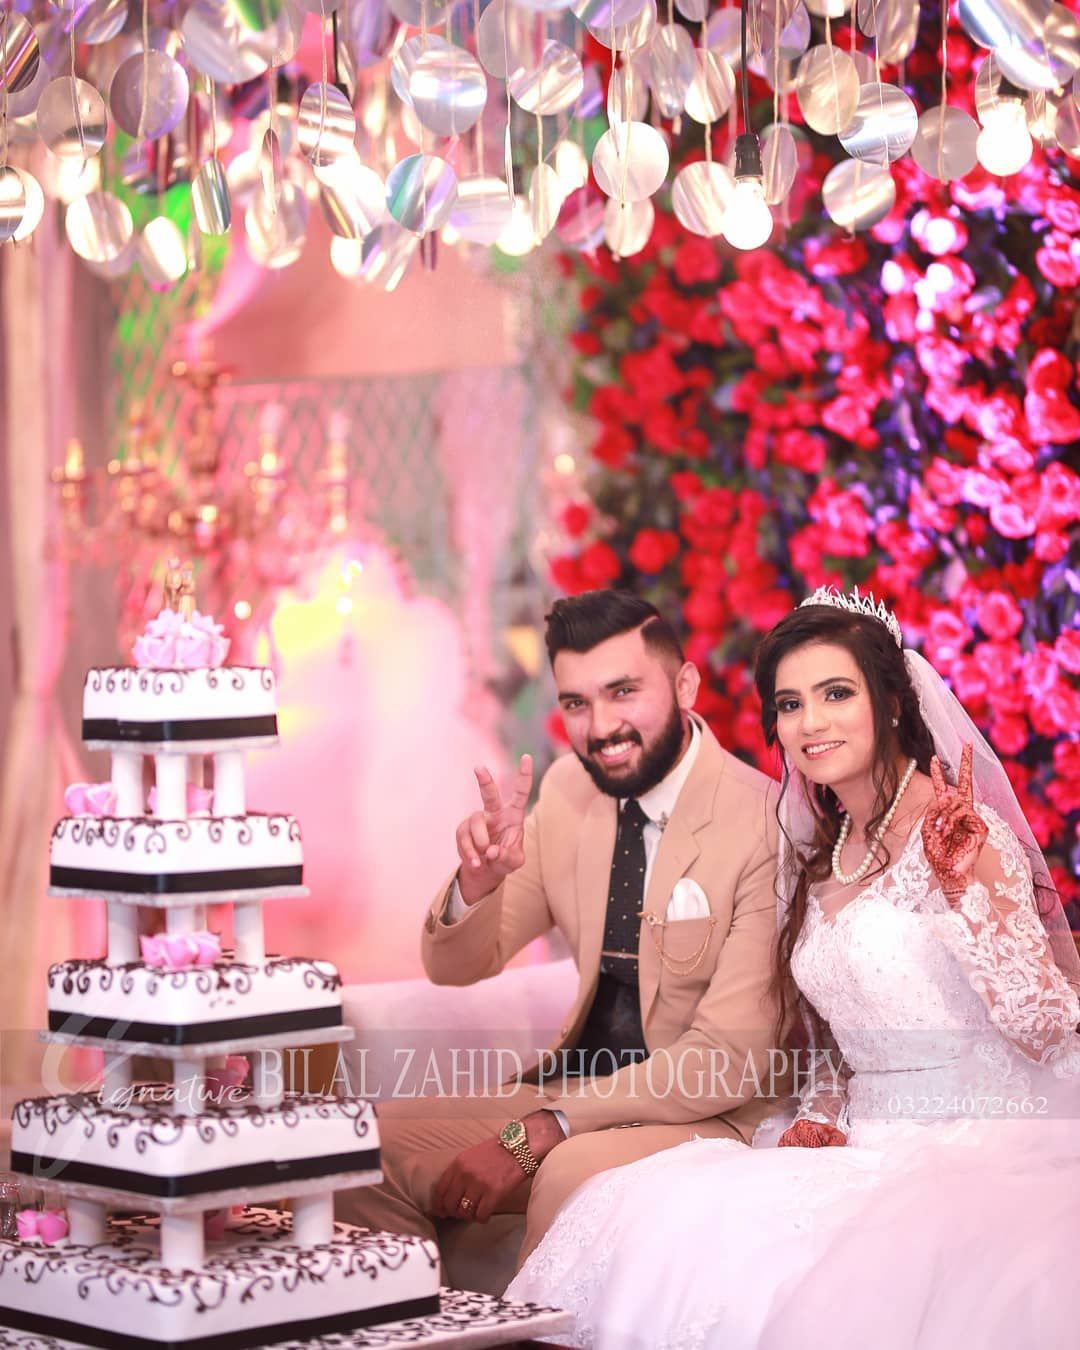 #couples #cristianwedding #ukwedding #shoot #bilal_zahid_photography #wedding_diaries #weddingdiaries #fashionblogger...